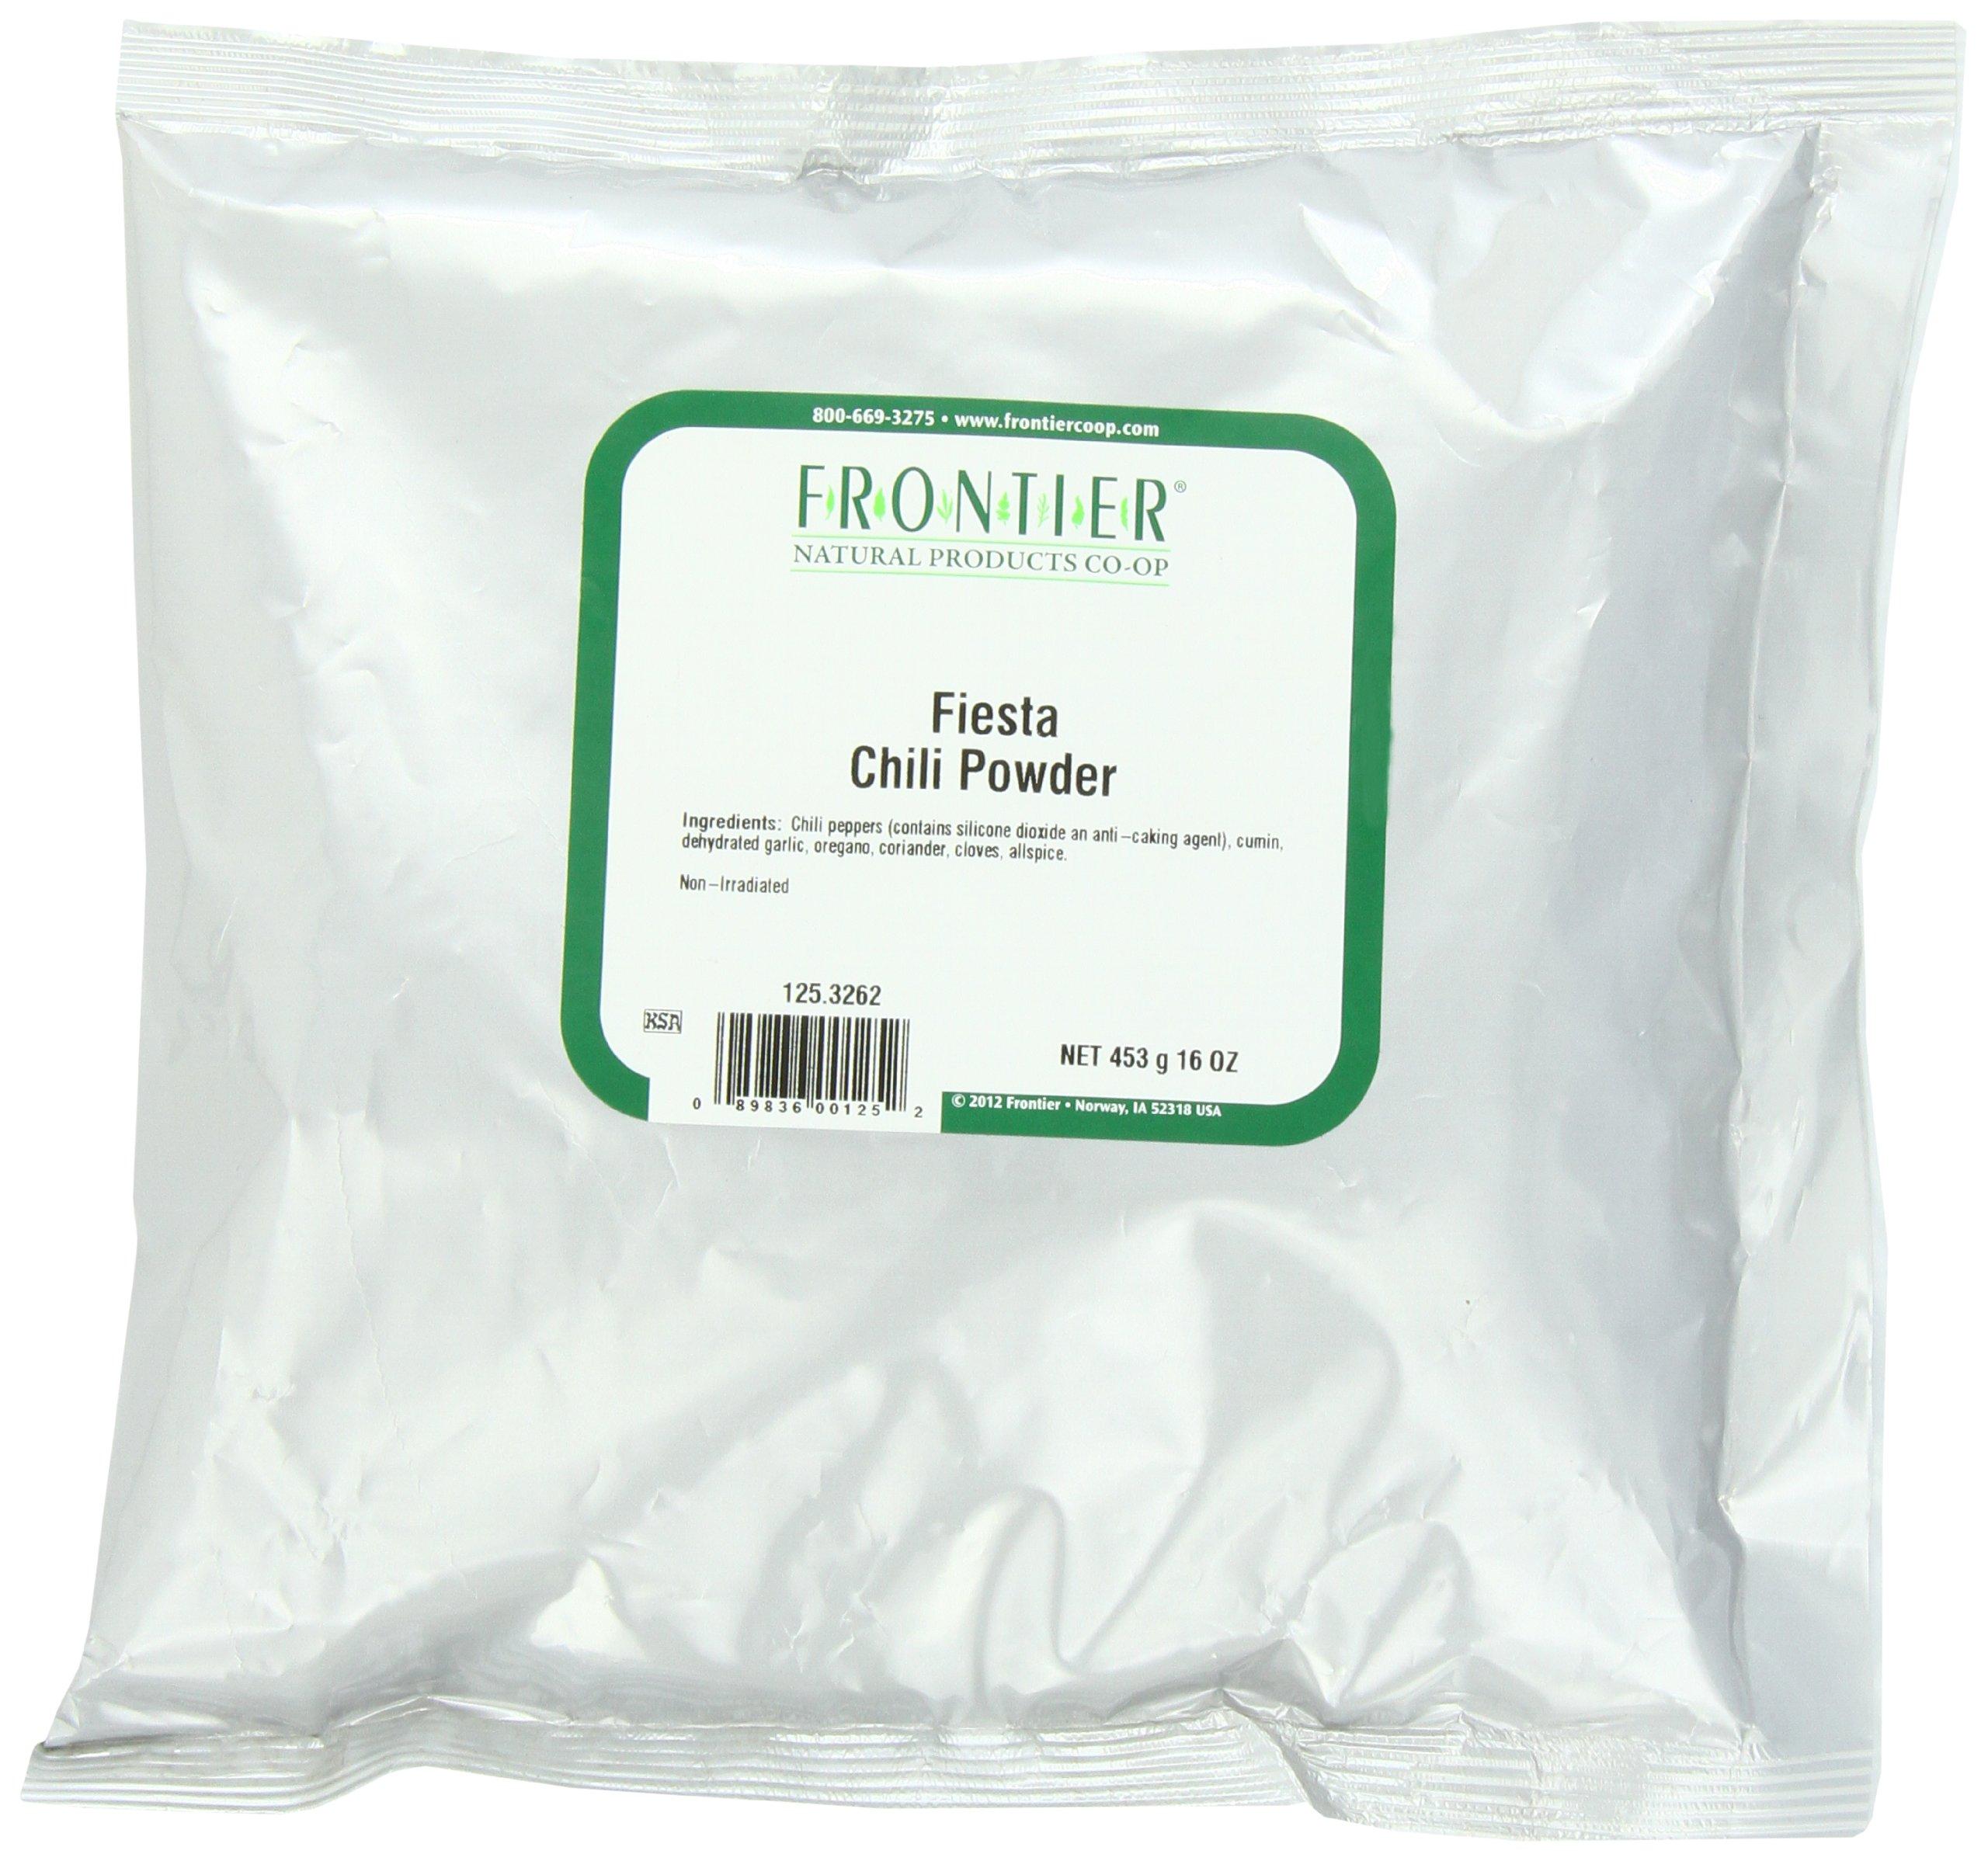 Frontier Chili Powder Blend, Fiesta, 16 Ounce Bag